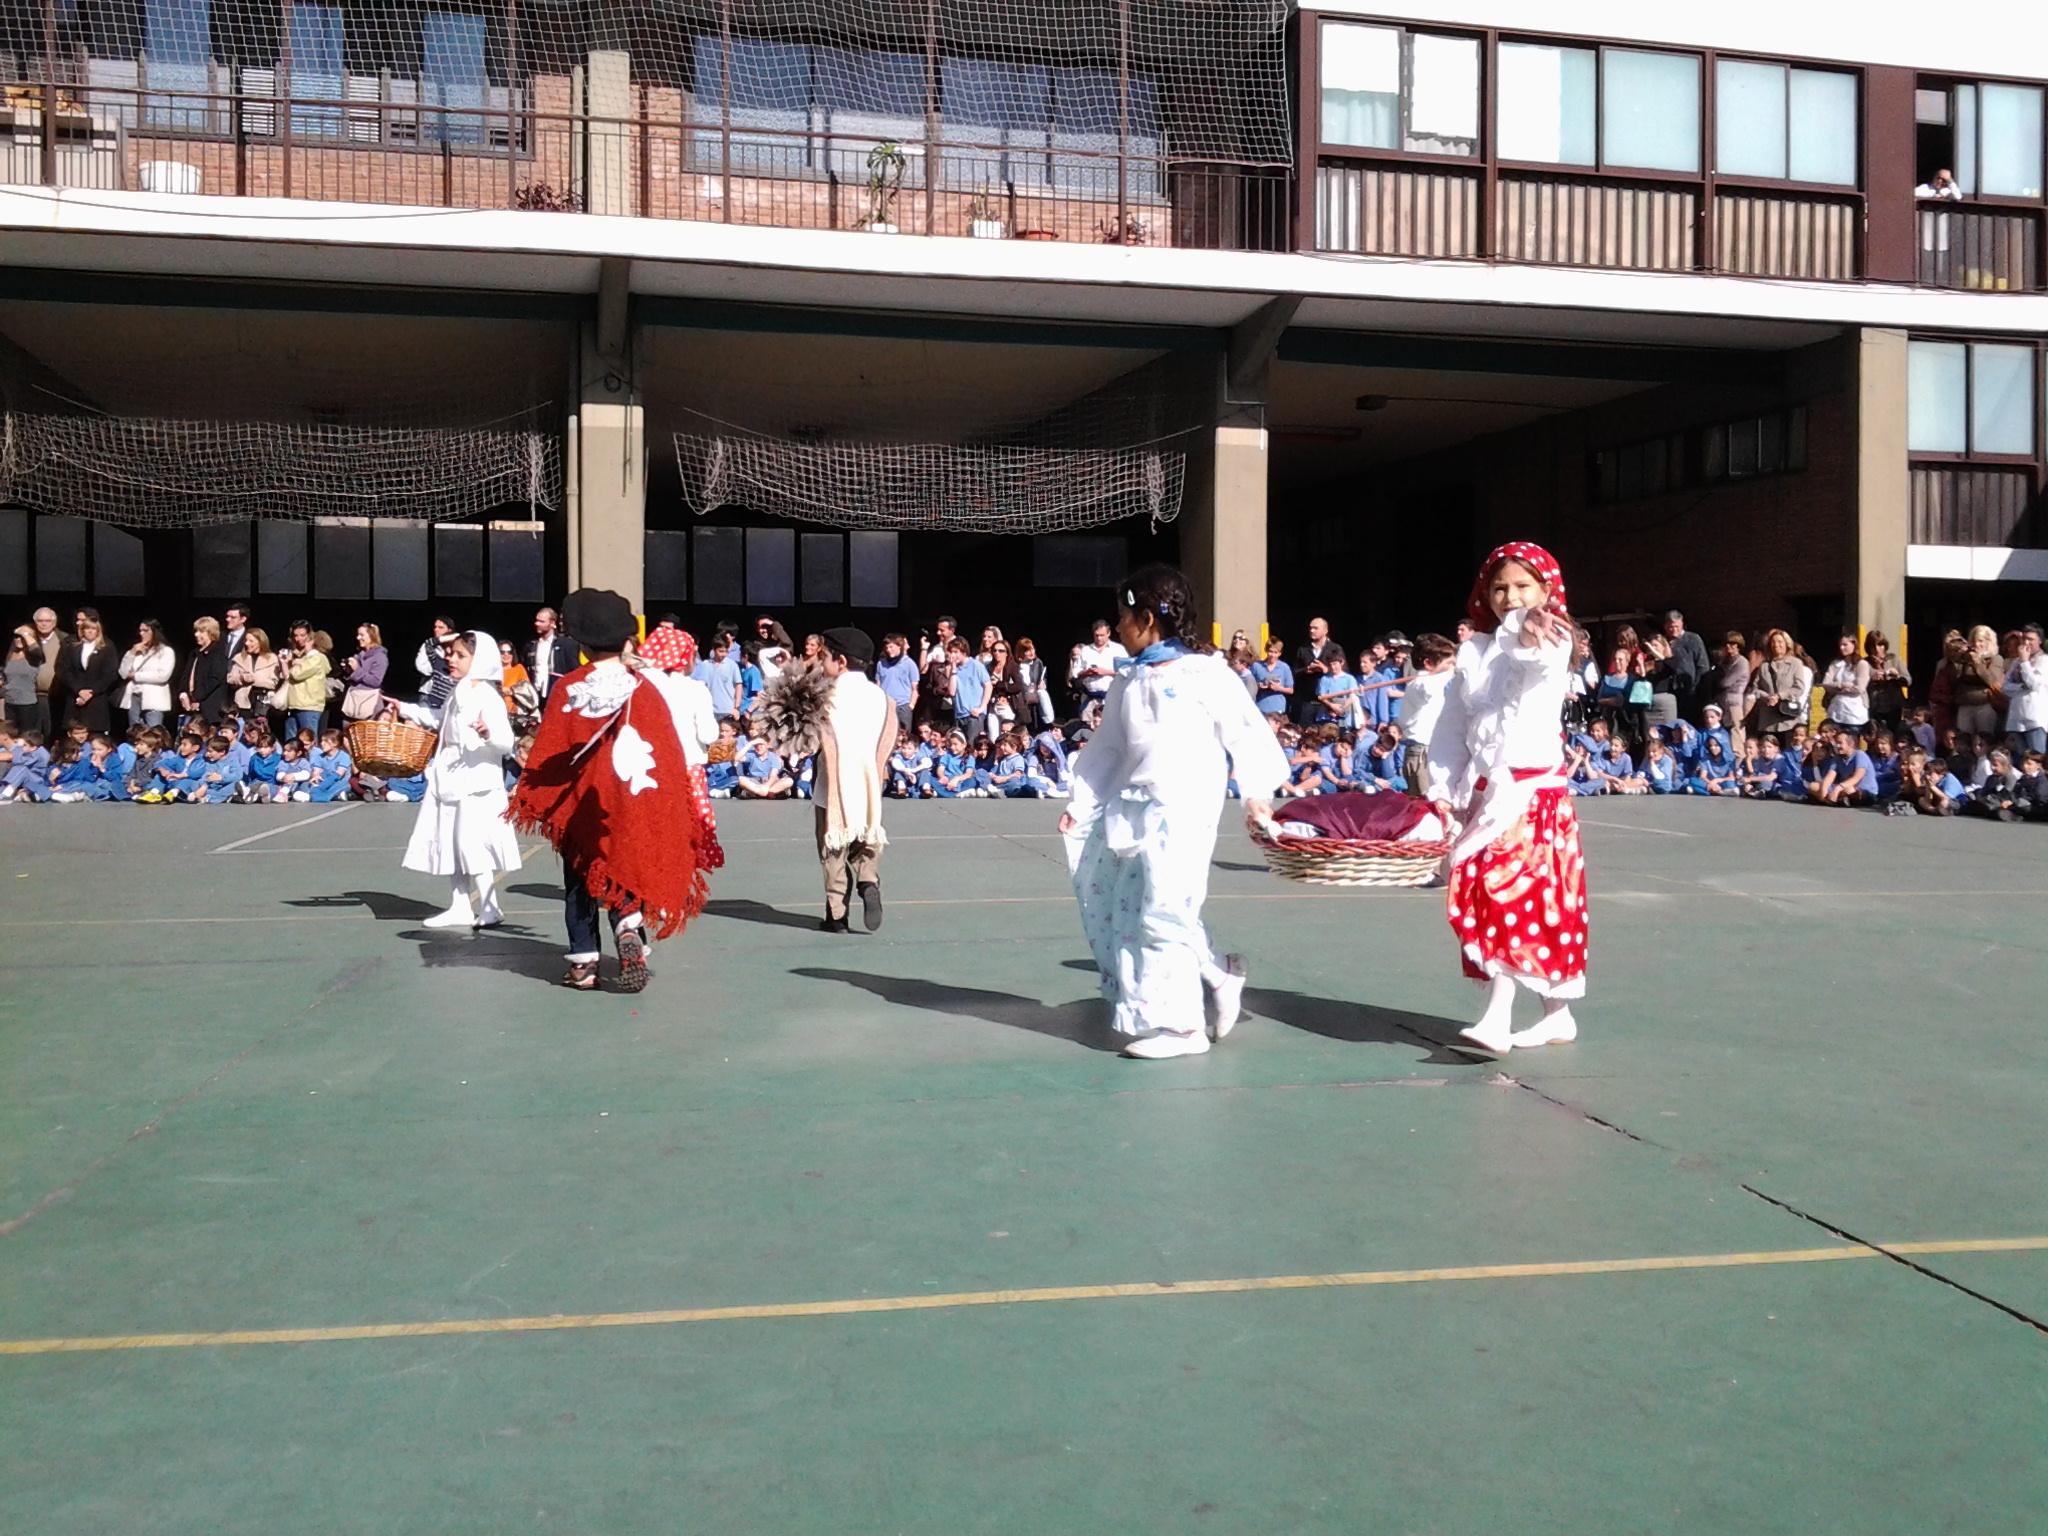 Colegio San agustín - Nivel primario